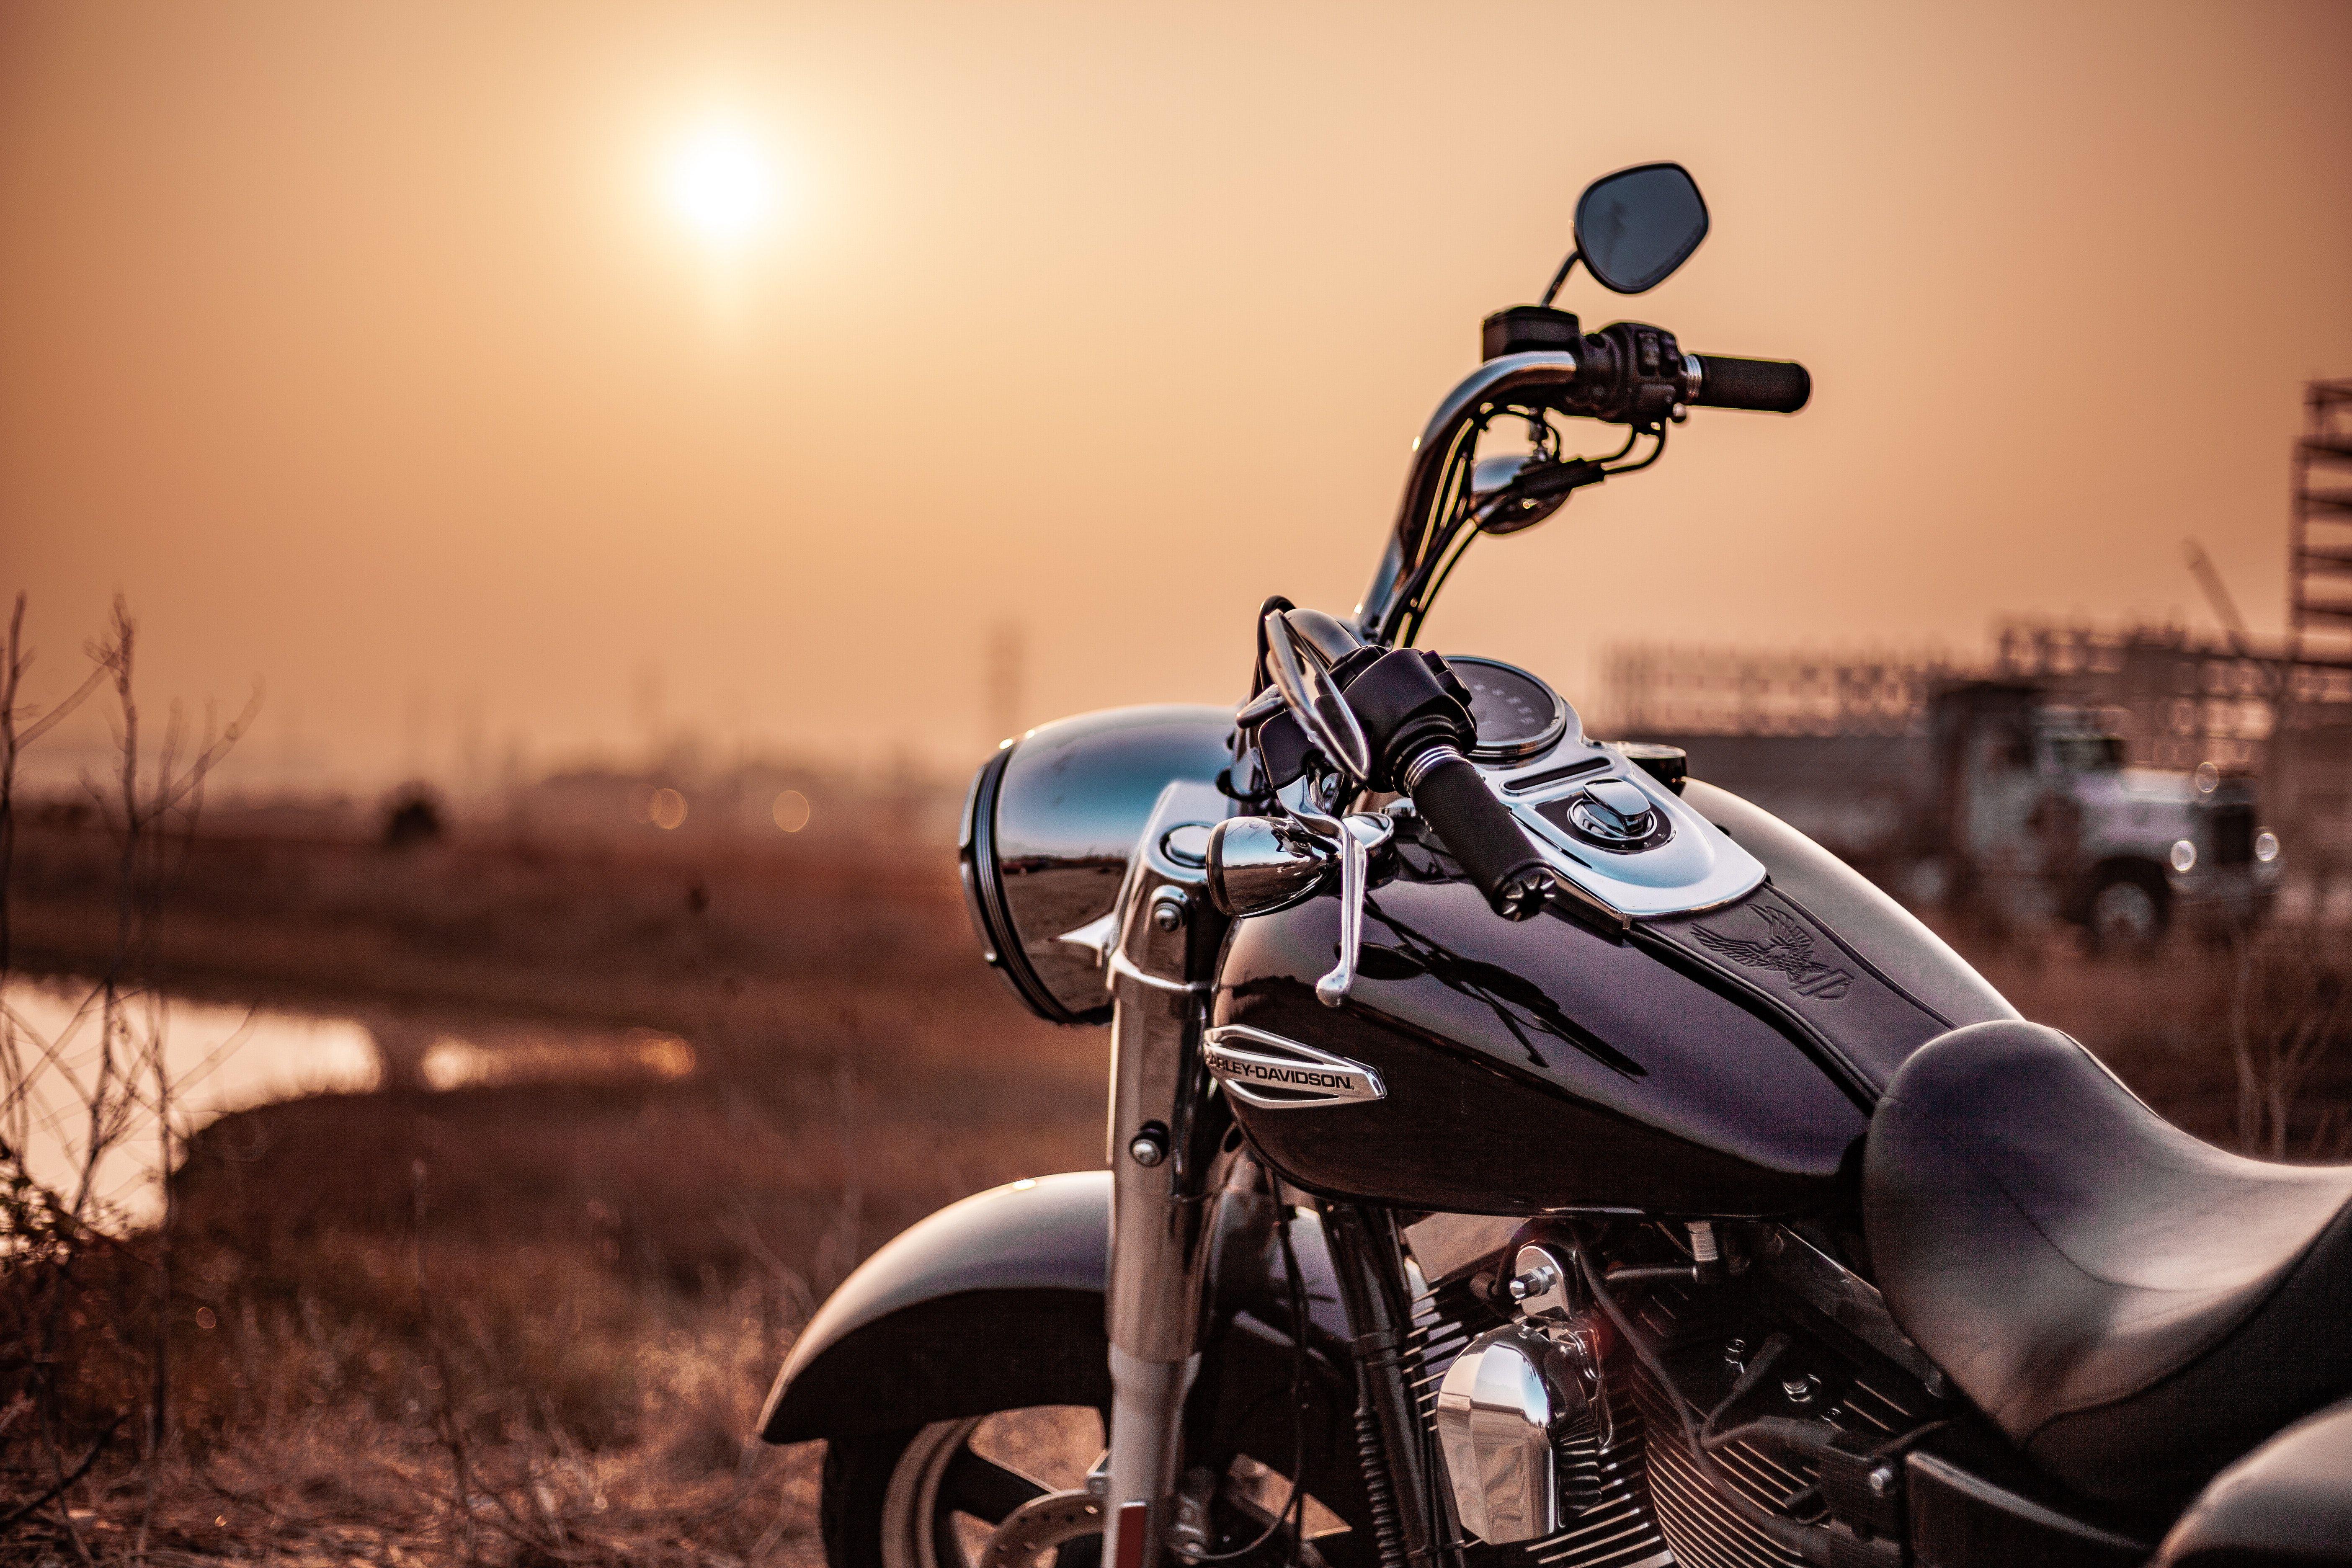 Cruiser Motorcycle Wallpapers   Top Cruiser Motorcycle 5616x3744